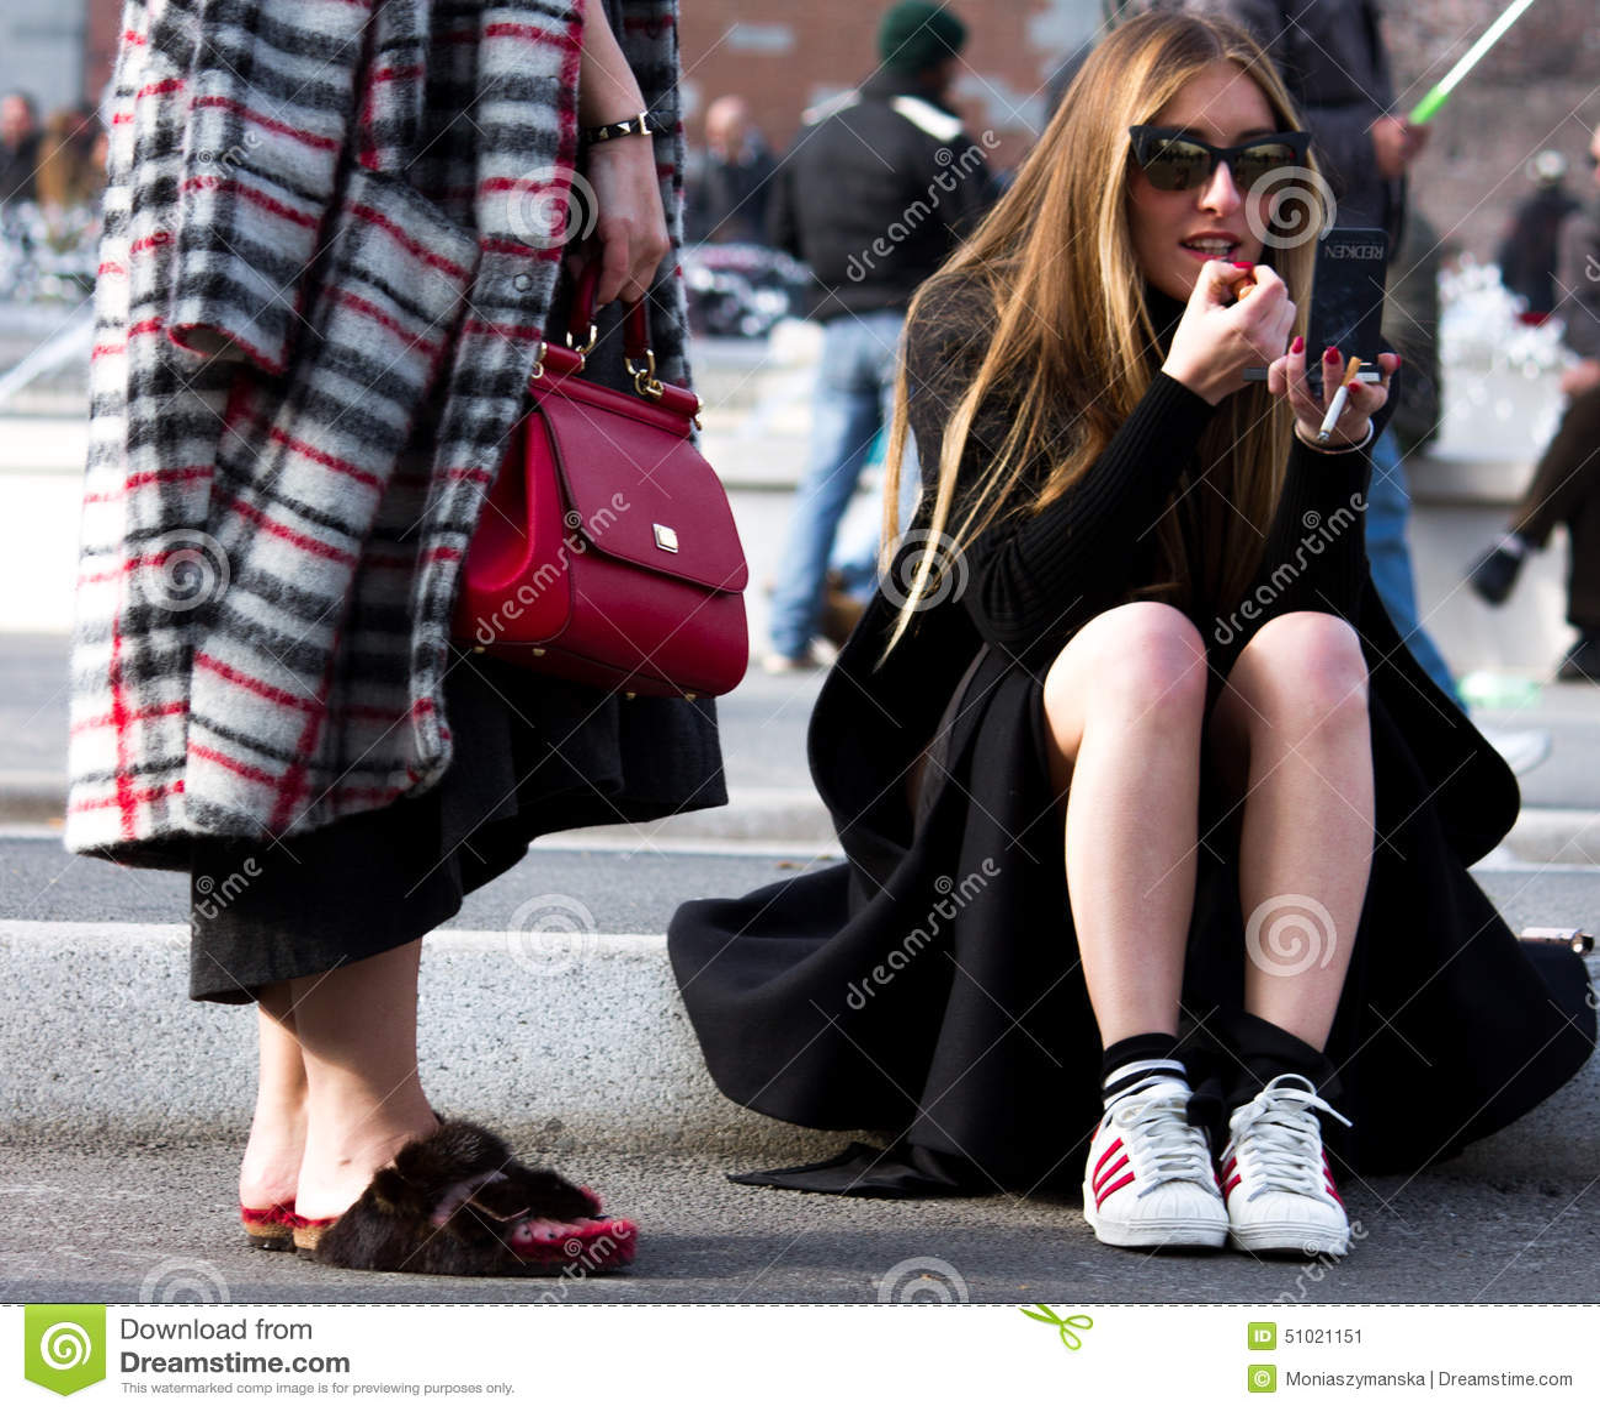 estilo da rua milan fashion week autumn winter 2015 16 foto editorial imagem 51021151. Black Bedroom Furniture Sets. Home Design Ideas